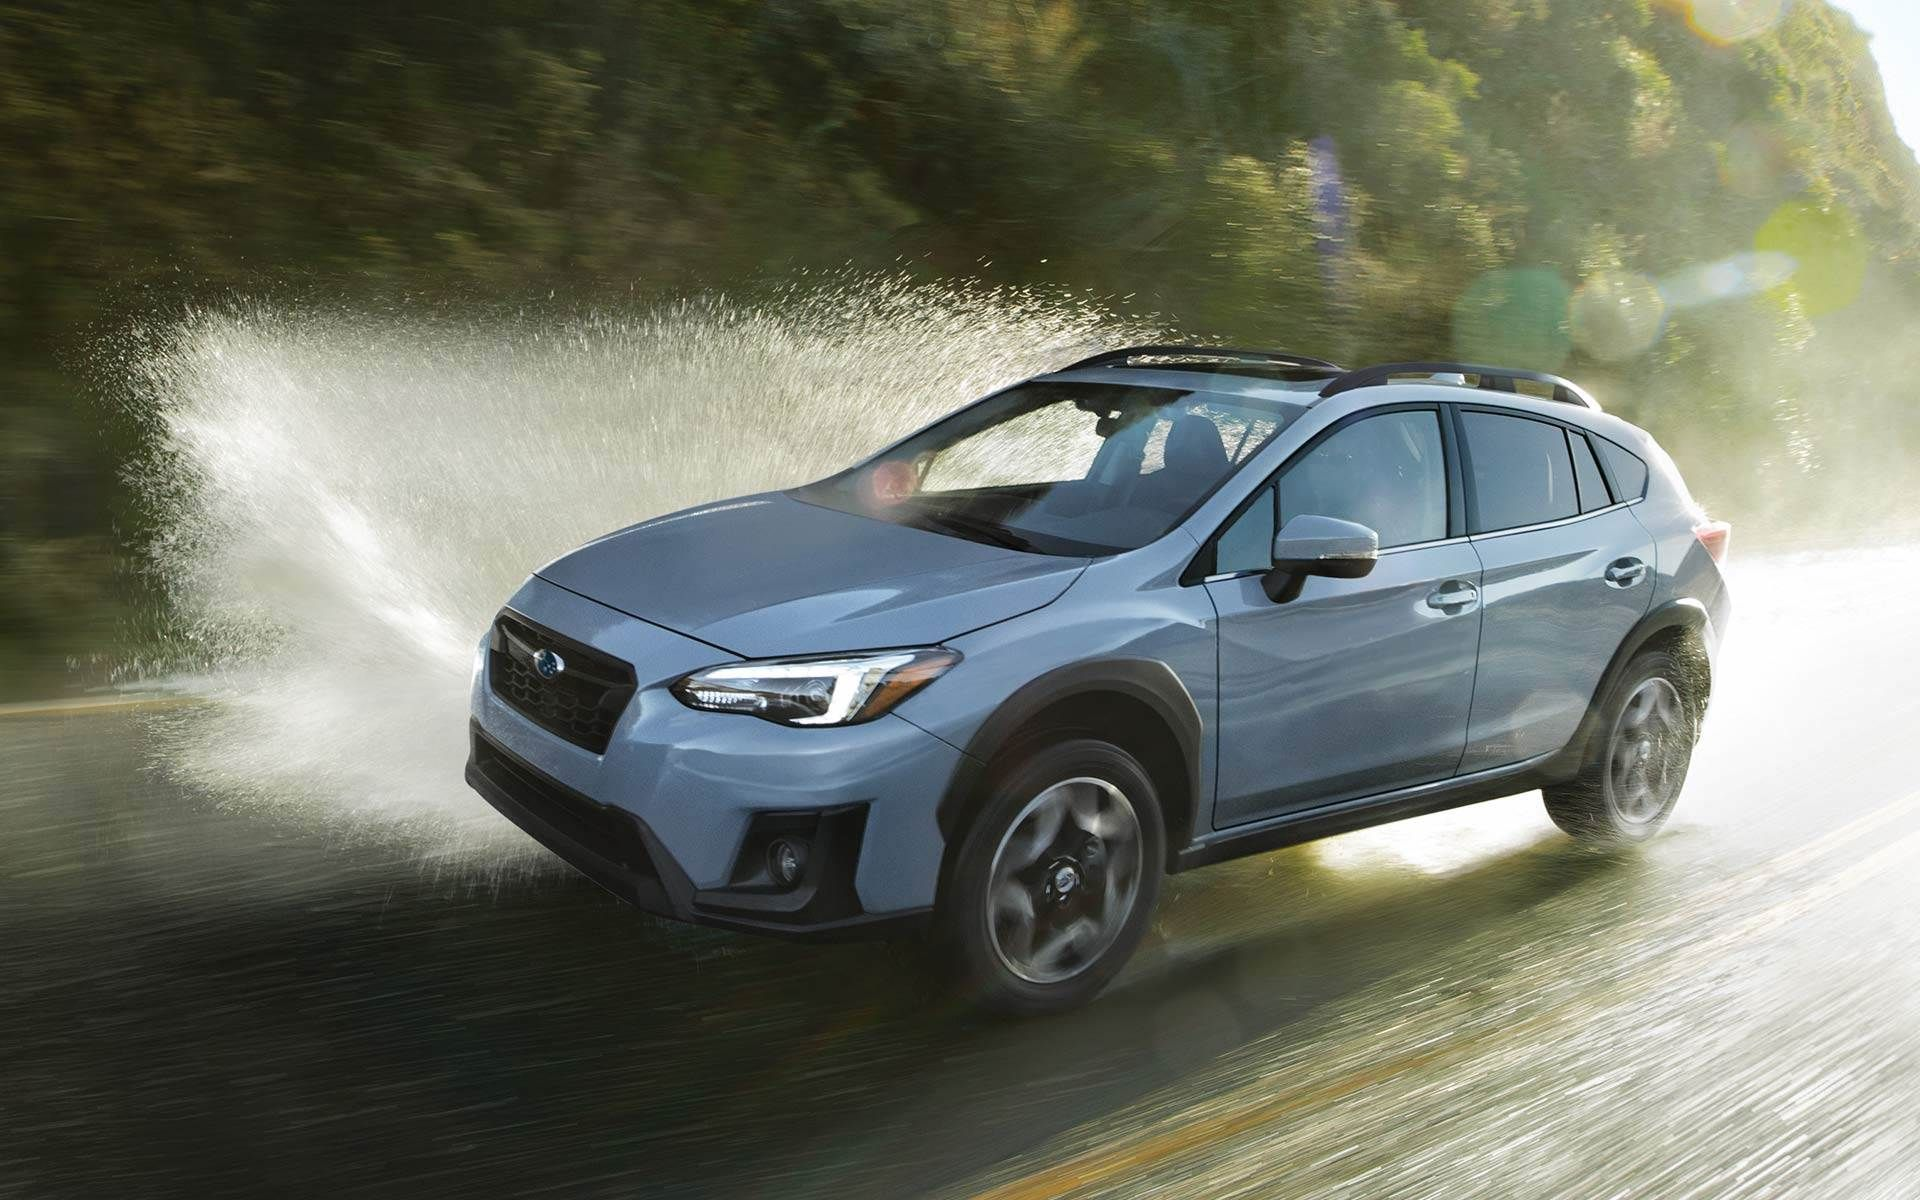 2019 Subaru Crosstrek Subaru Crosstrek Subaru Impreza